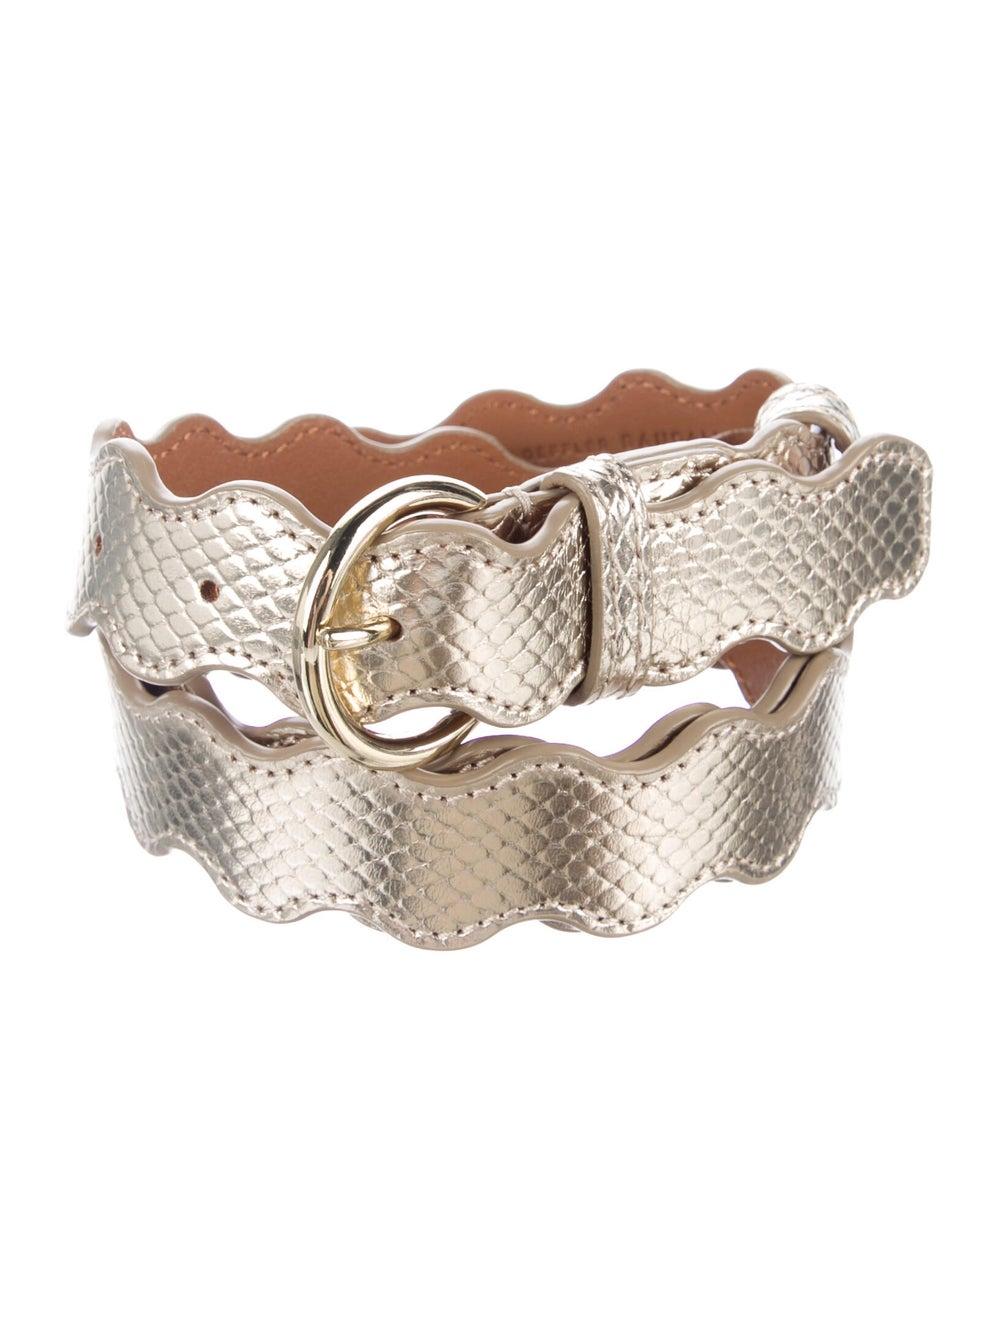 Loeffler Randall Leather Belt Gold - image 1